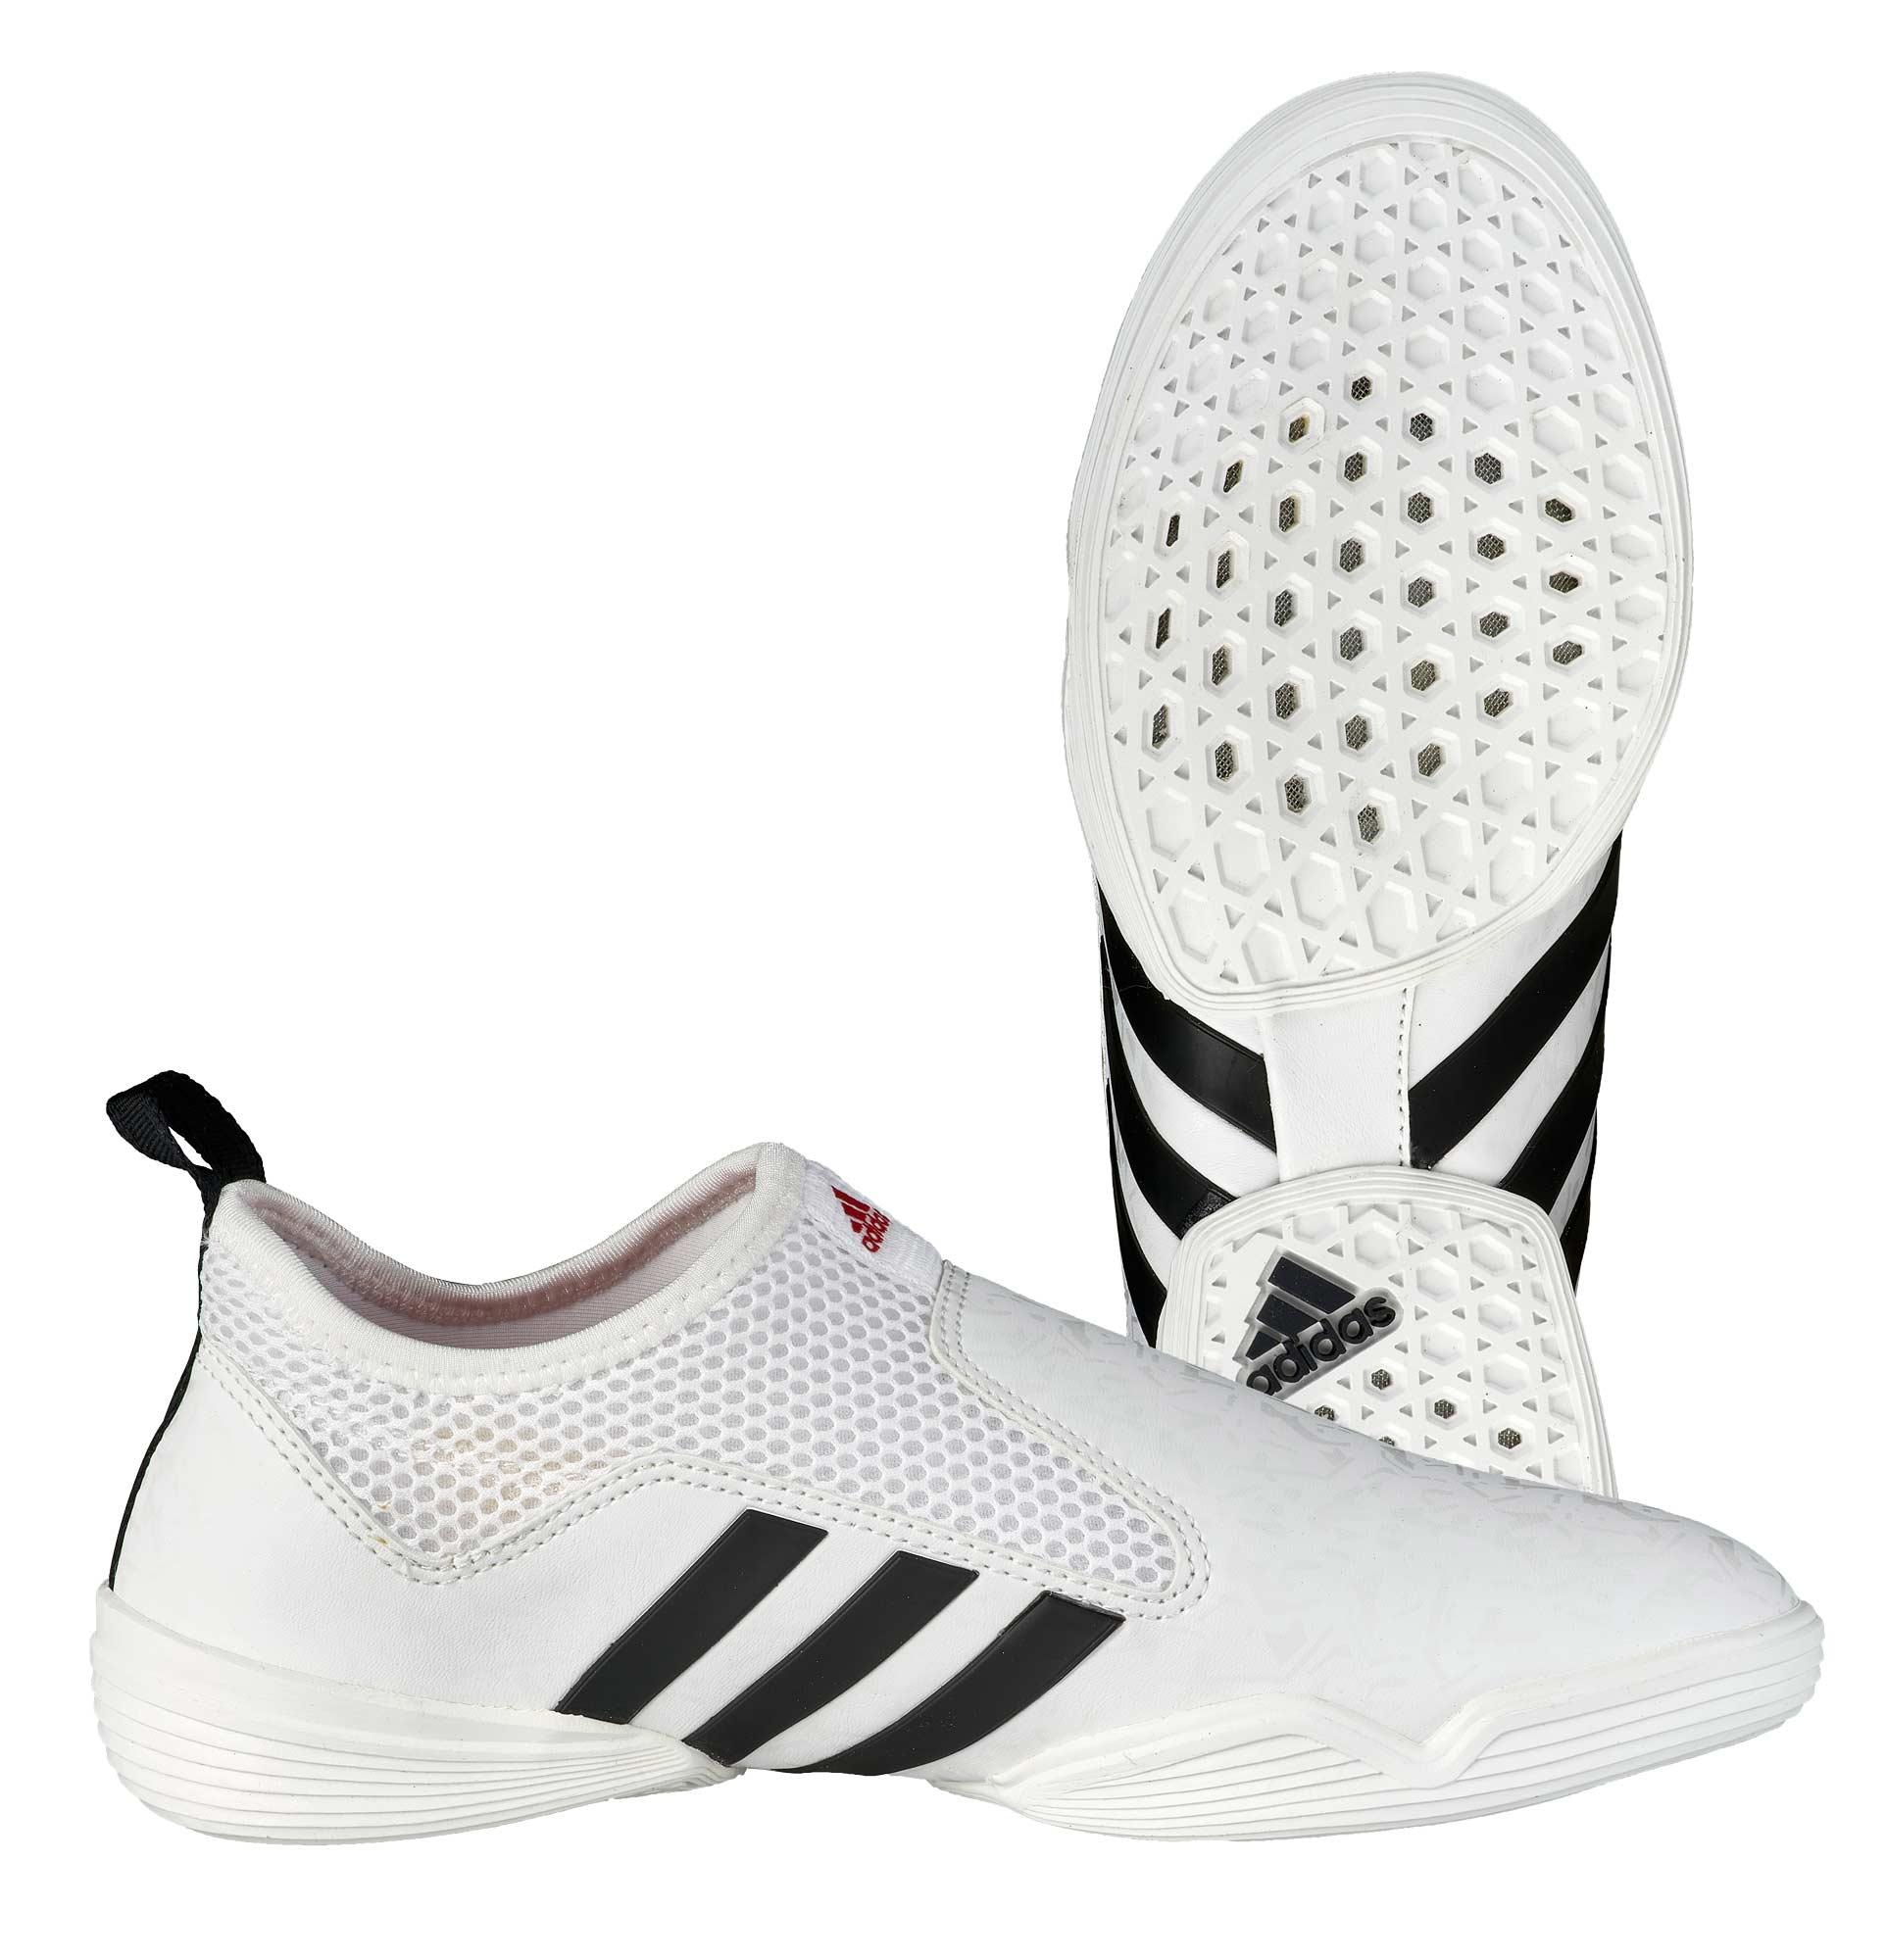 Adidas Adilux Schuhe Sneaker Turnschuhe weiß 11, 45 13